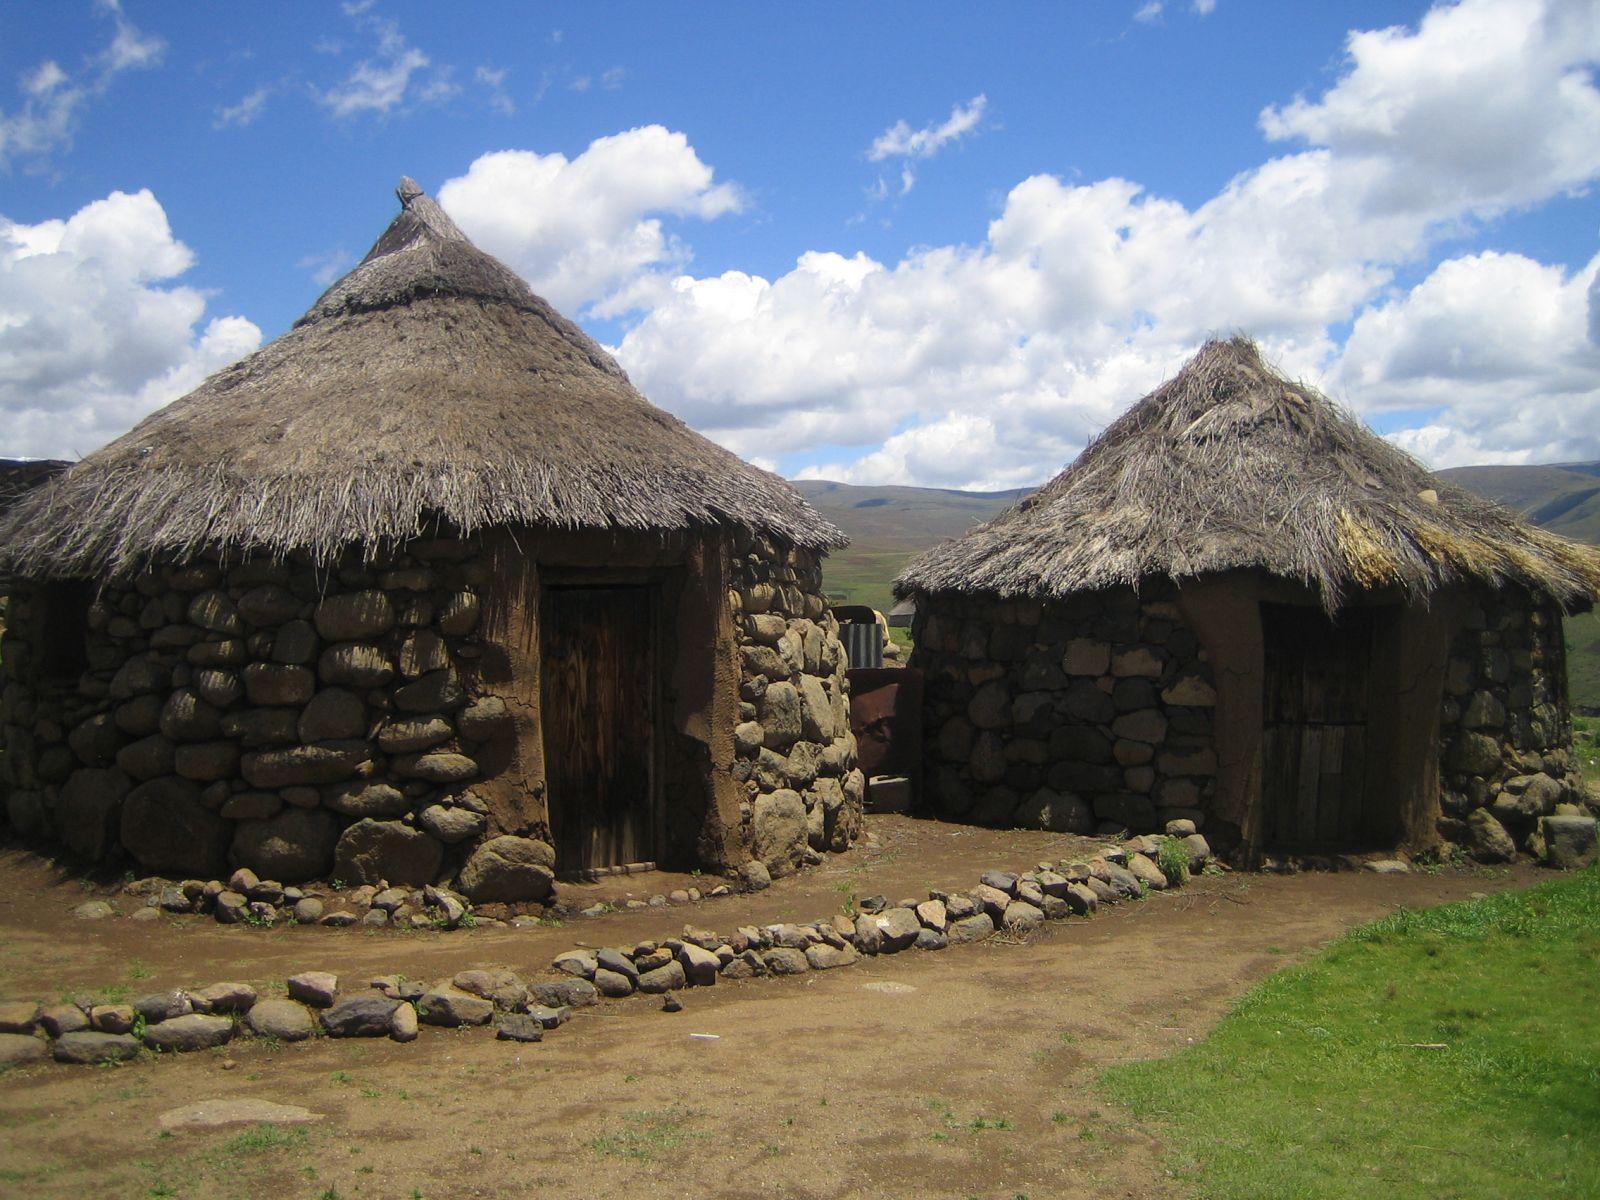 Лесото 7P8YY DX Новости